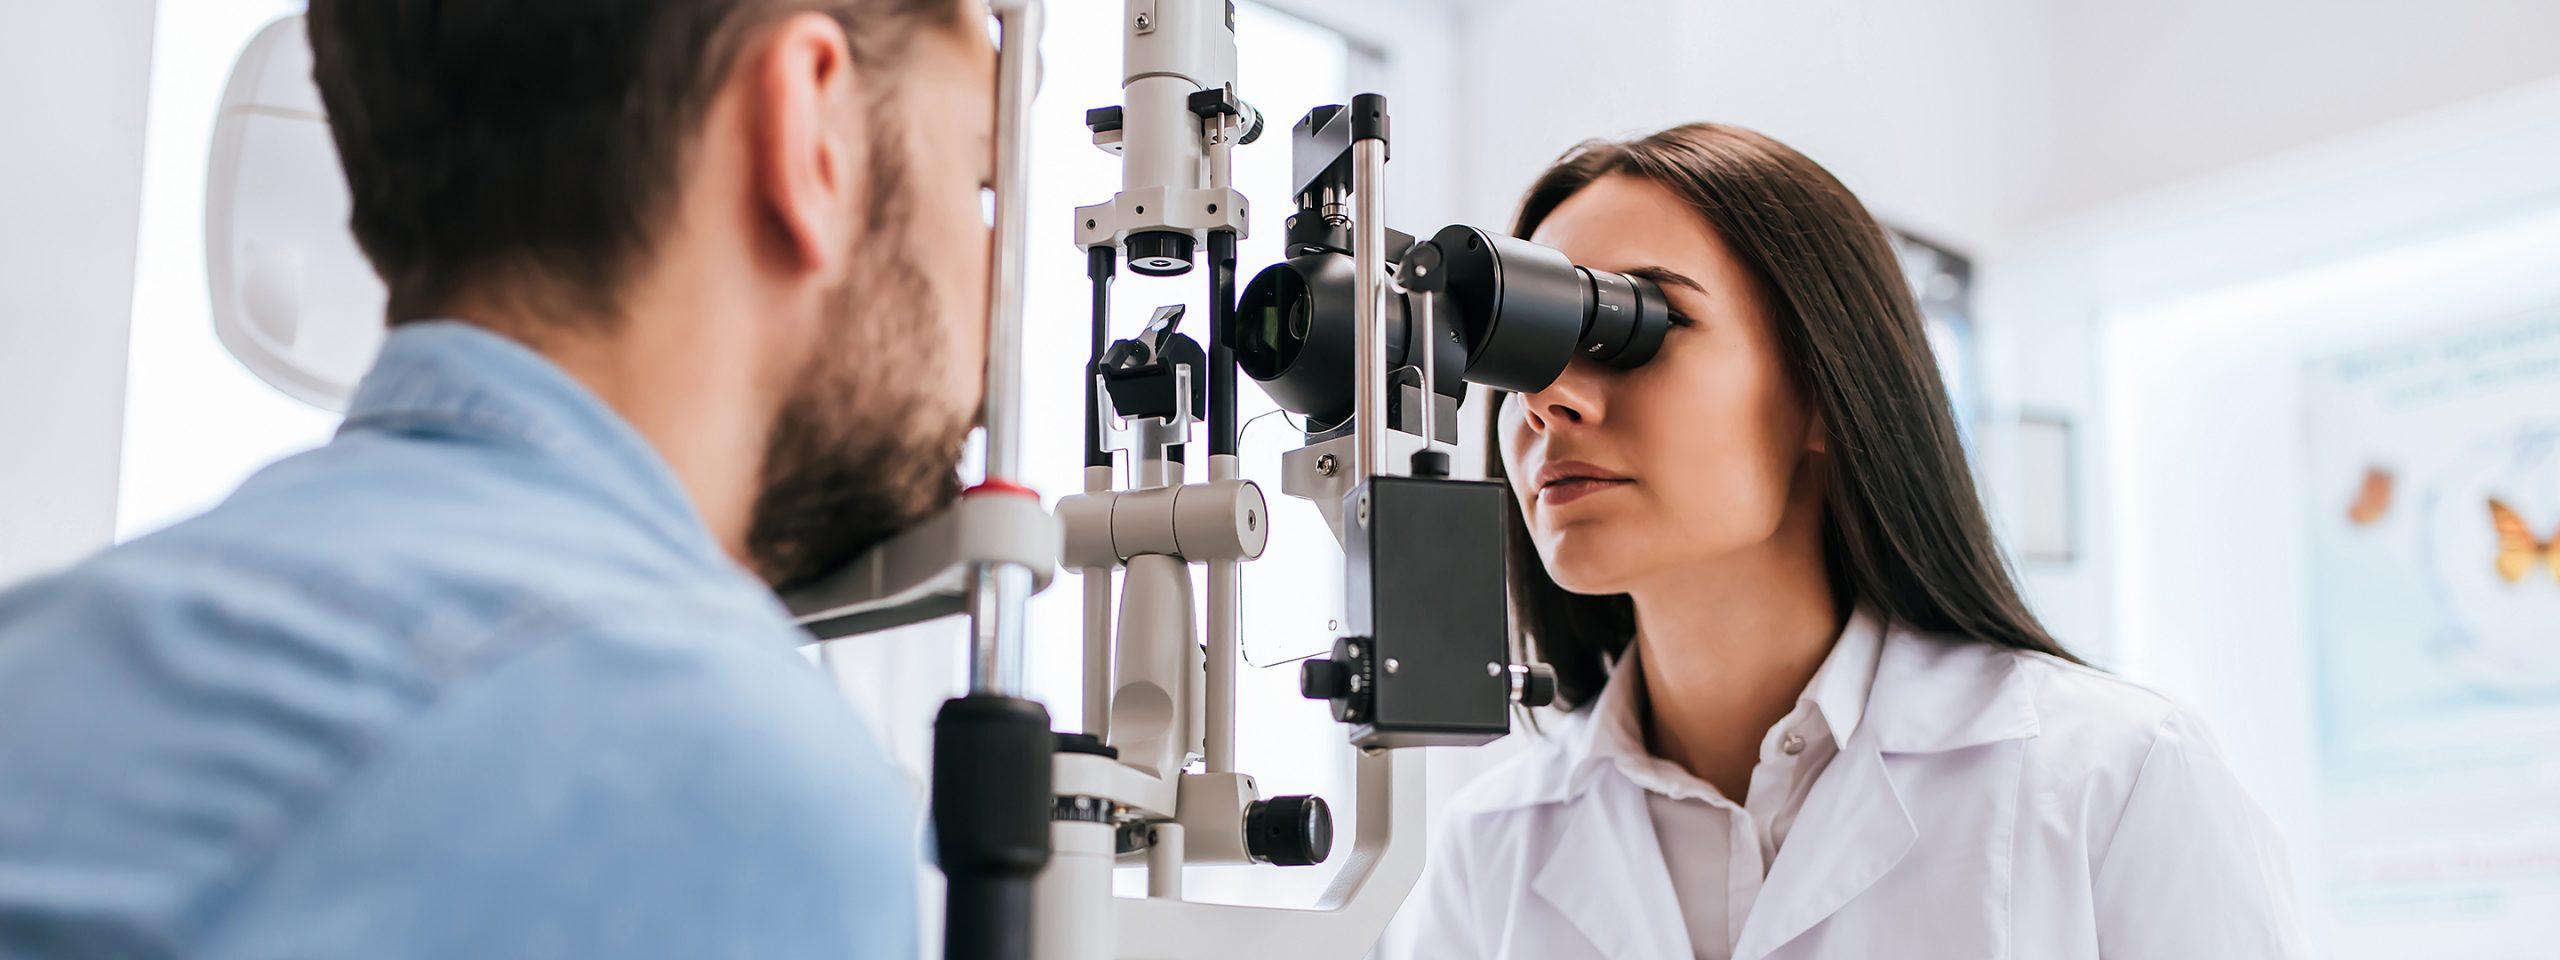 Photo of female optometrist giving an exam.